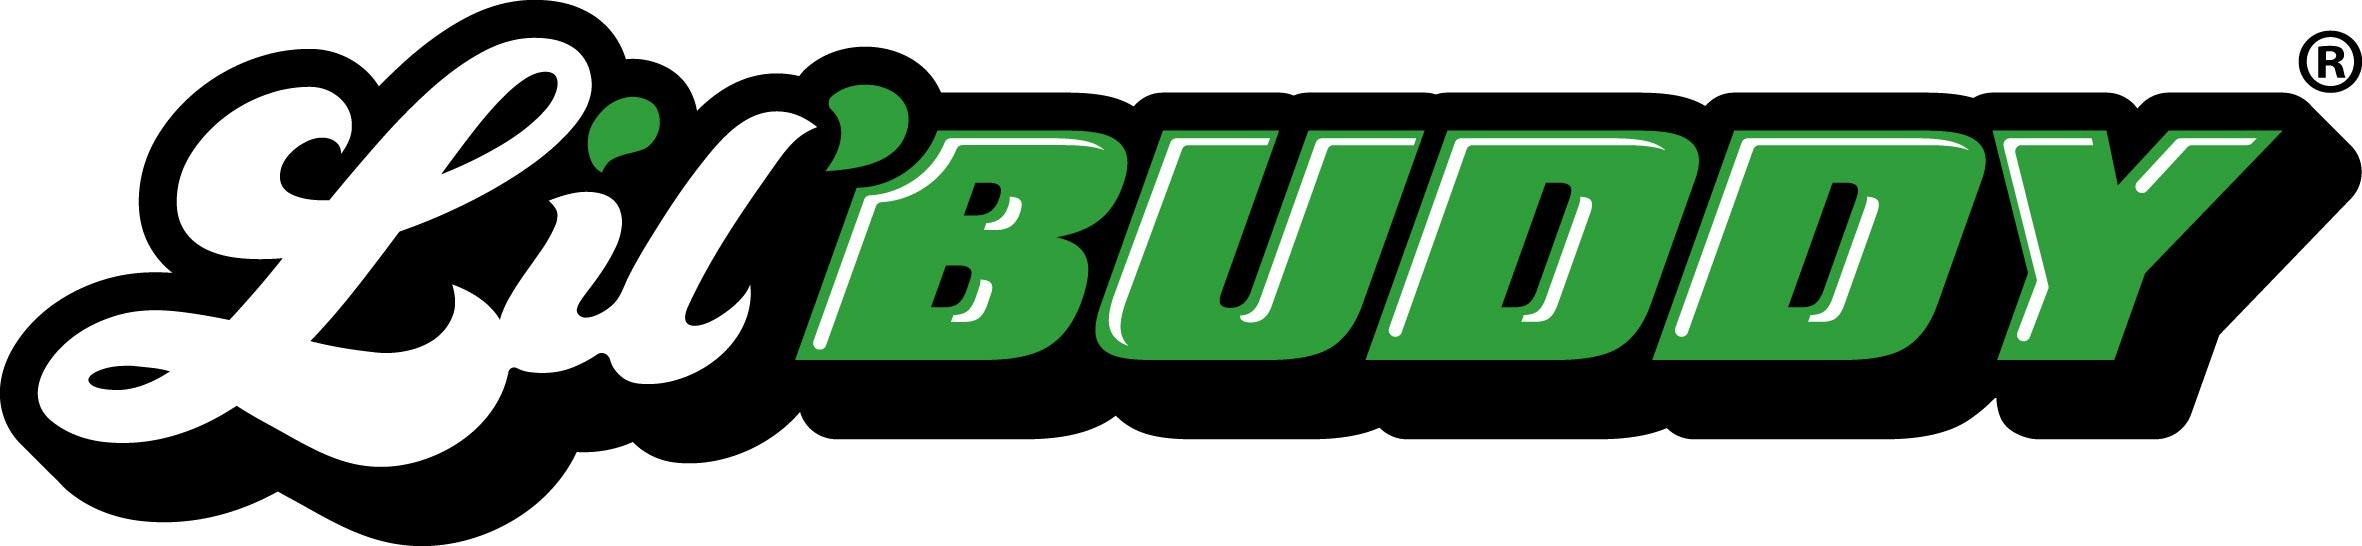 Logo Ruff Cycles Lil Buddy